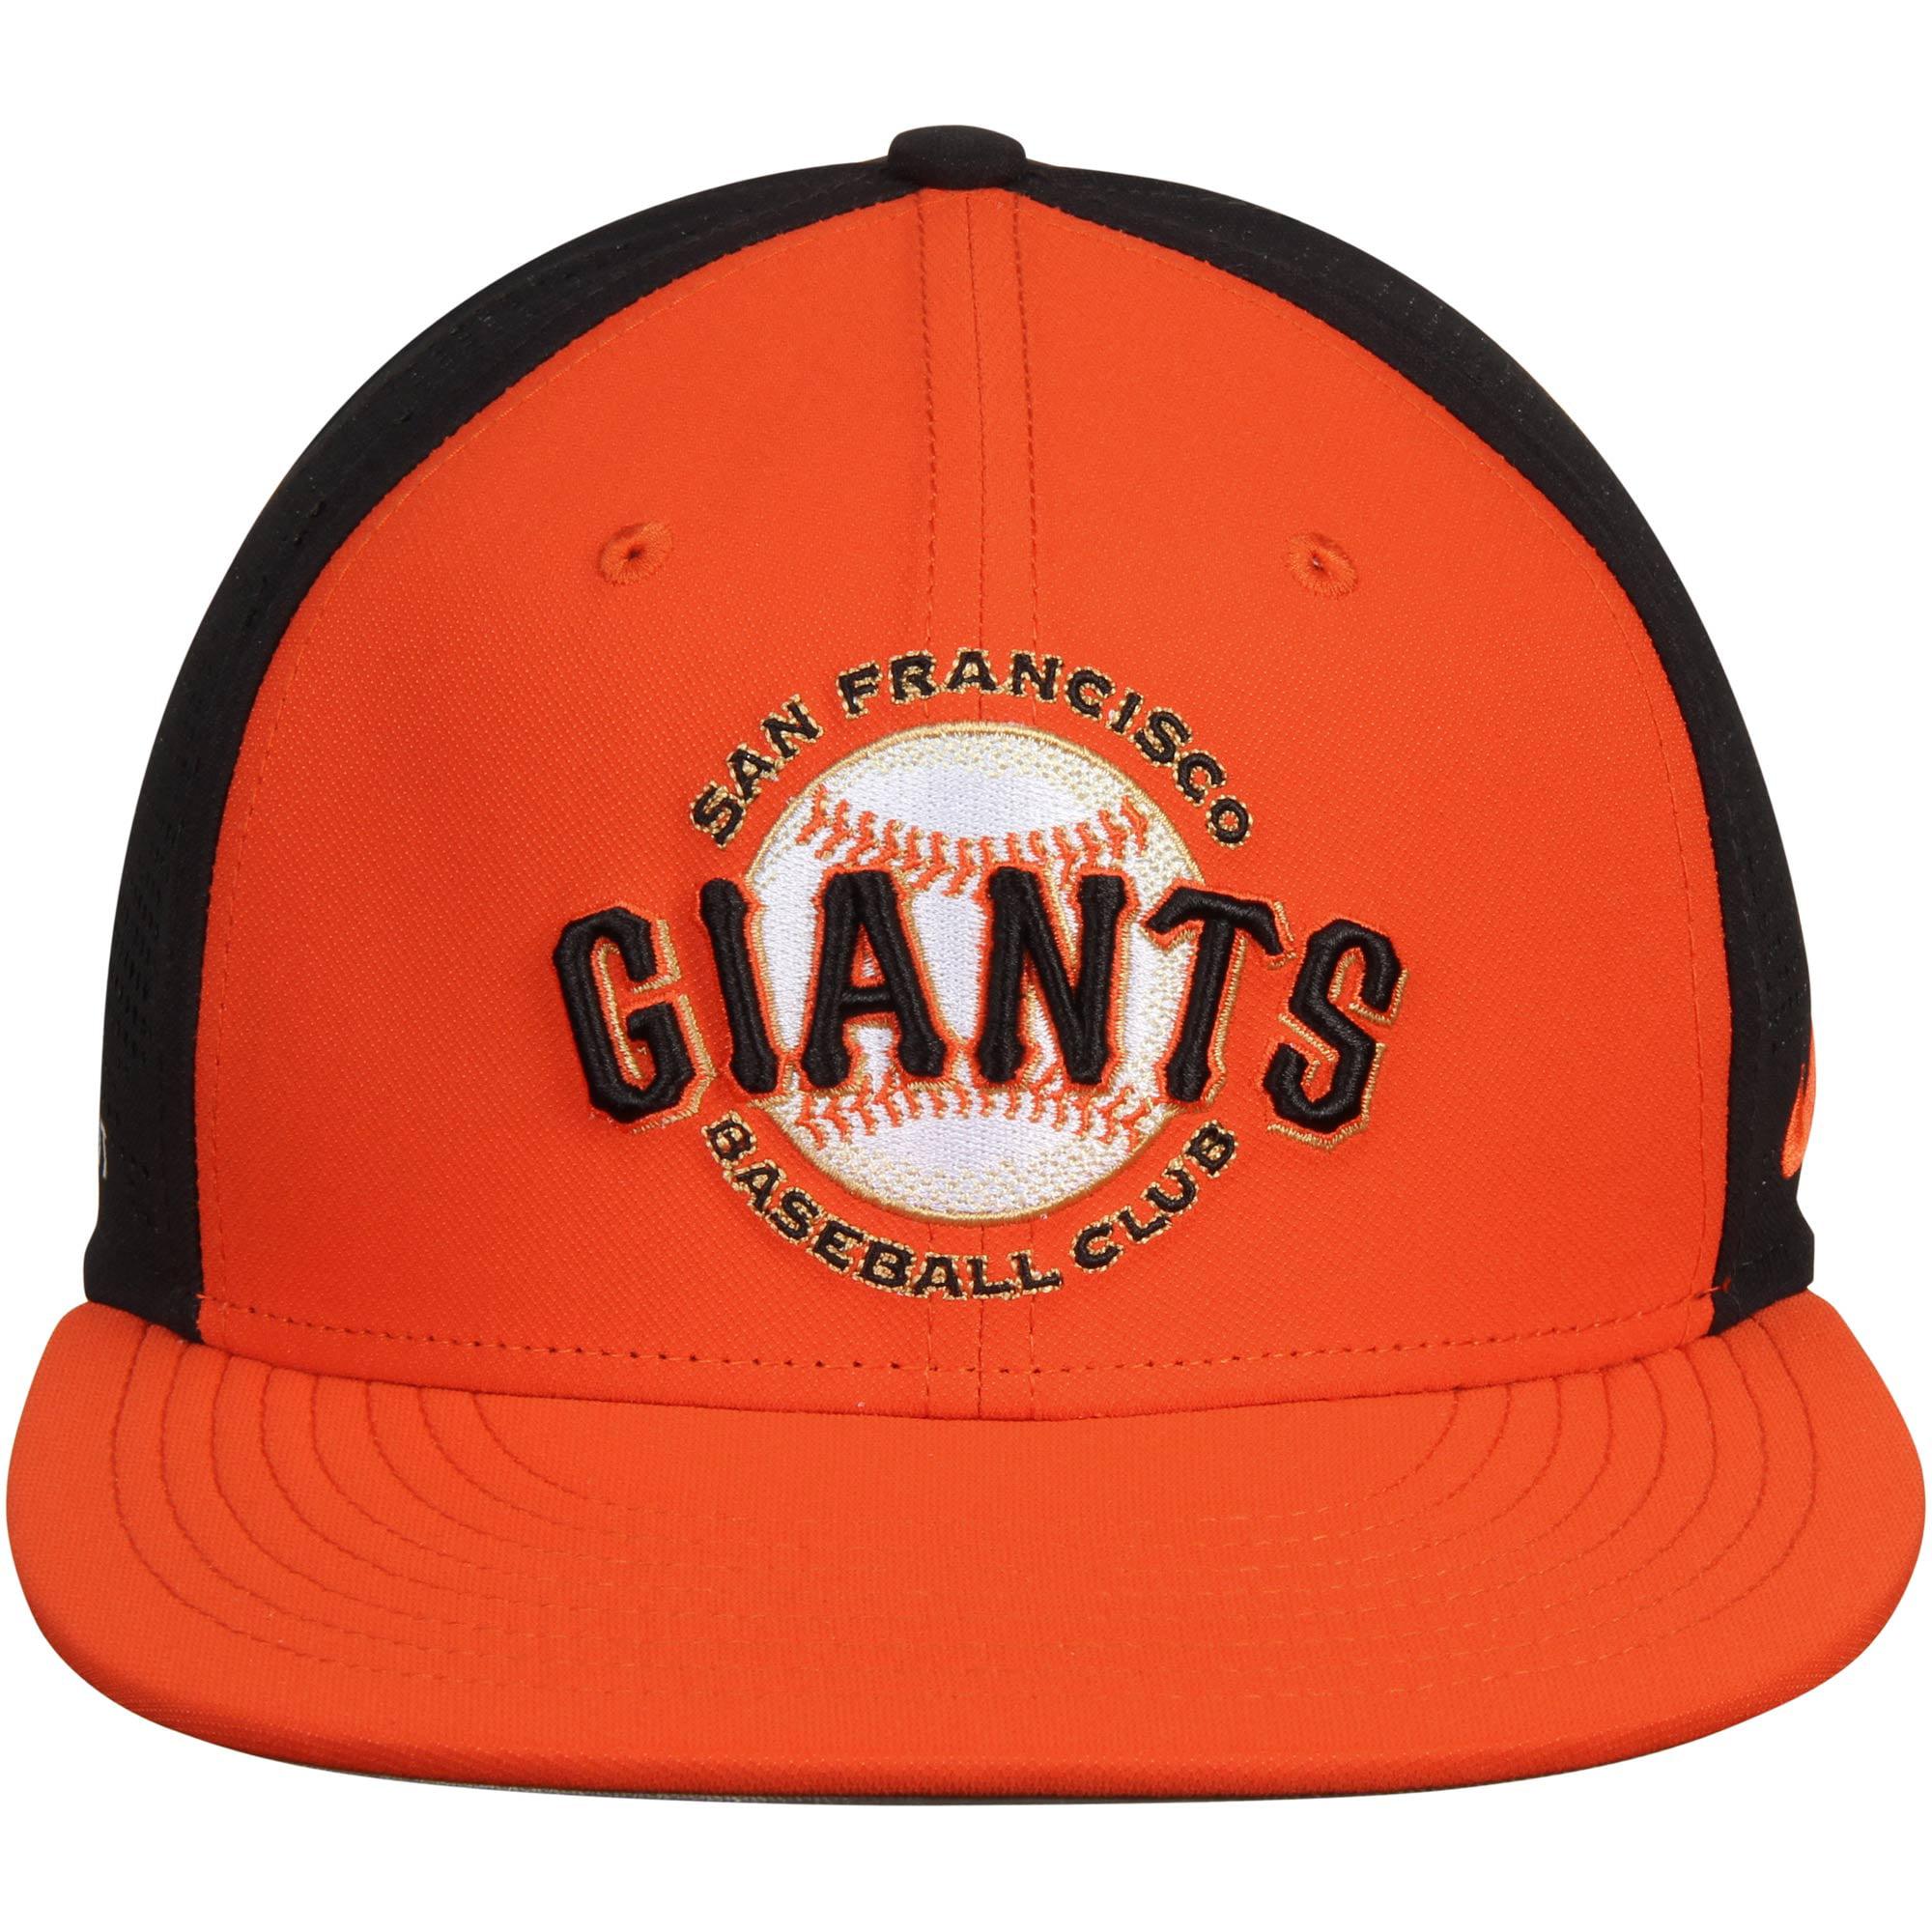 9054c240d14 San Francisco Giants Nike True Vapor Swoosh Performance Flex Hat -  Orange/Black - Walmart.com